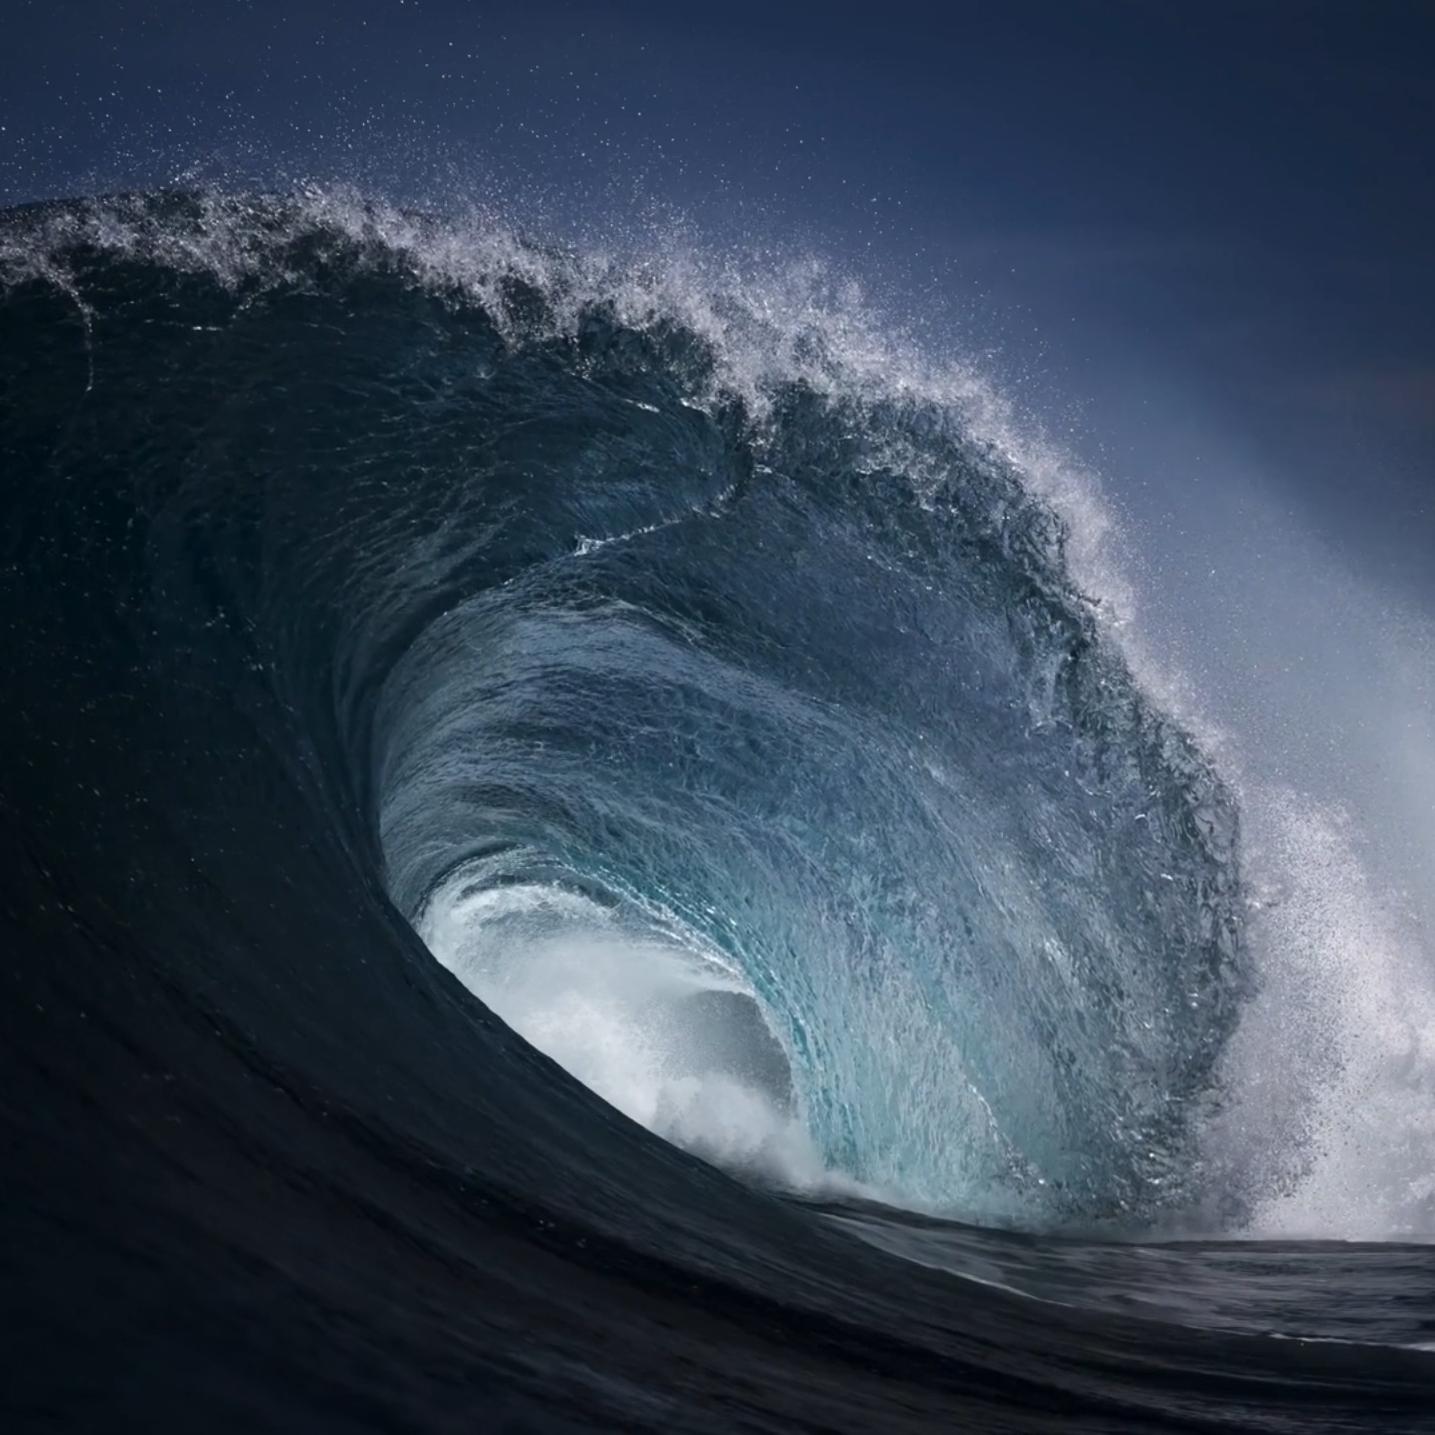 Wave Cinemagraph Wallpaper Engine